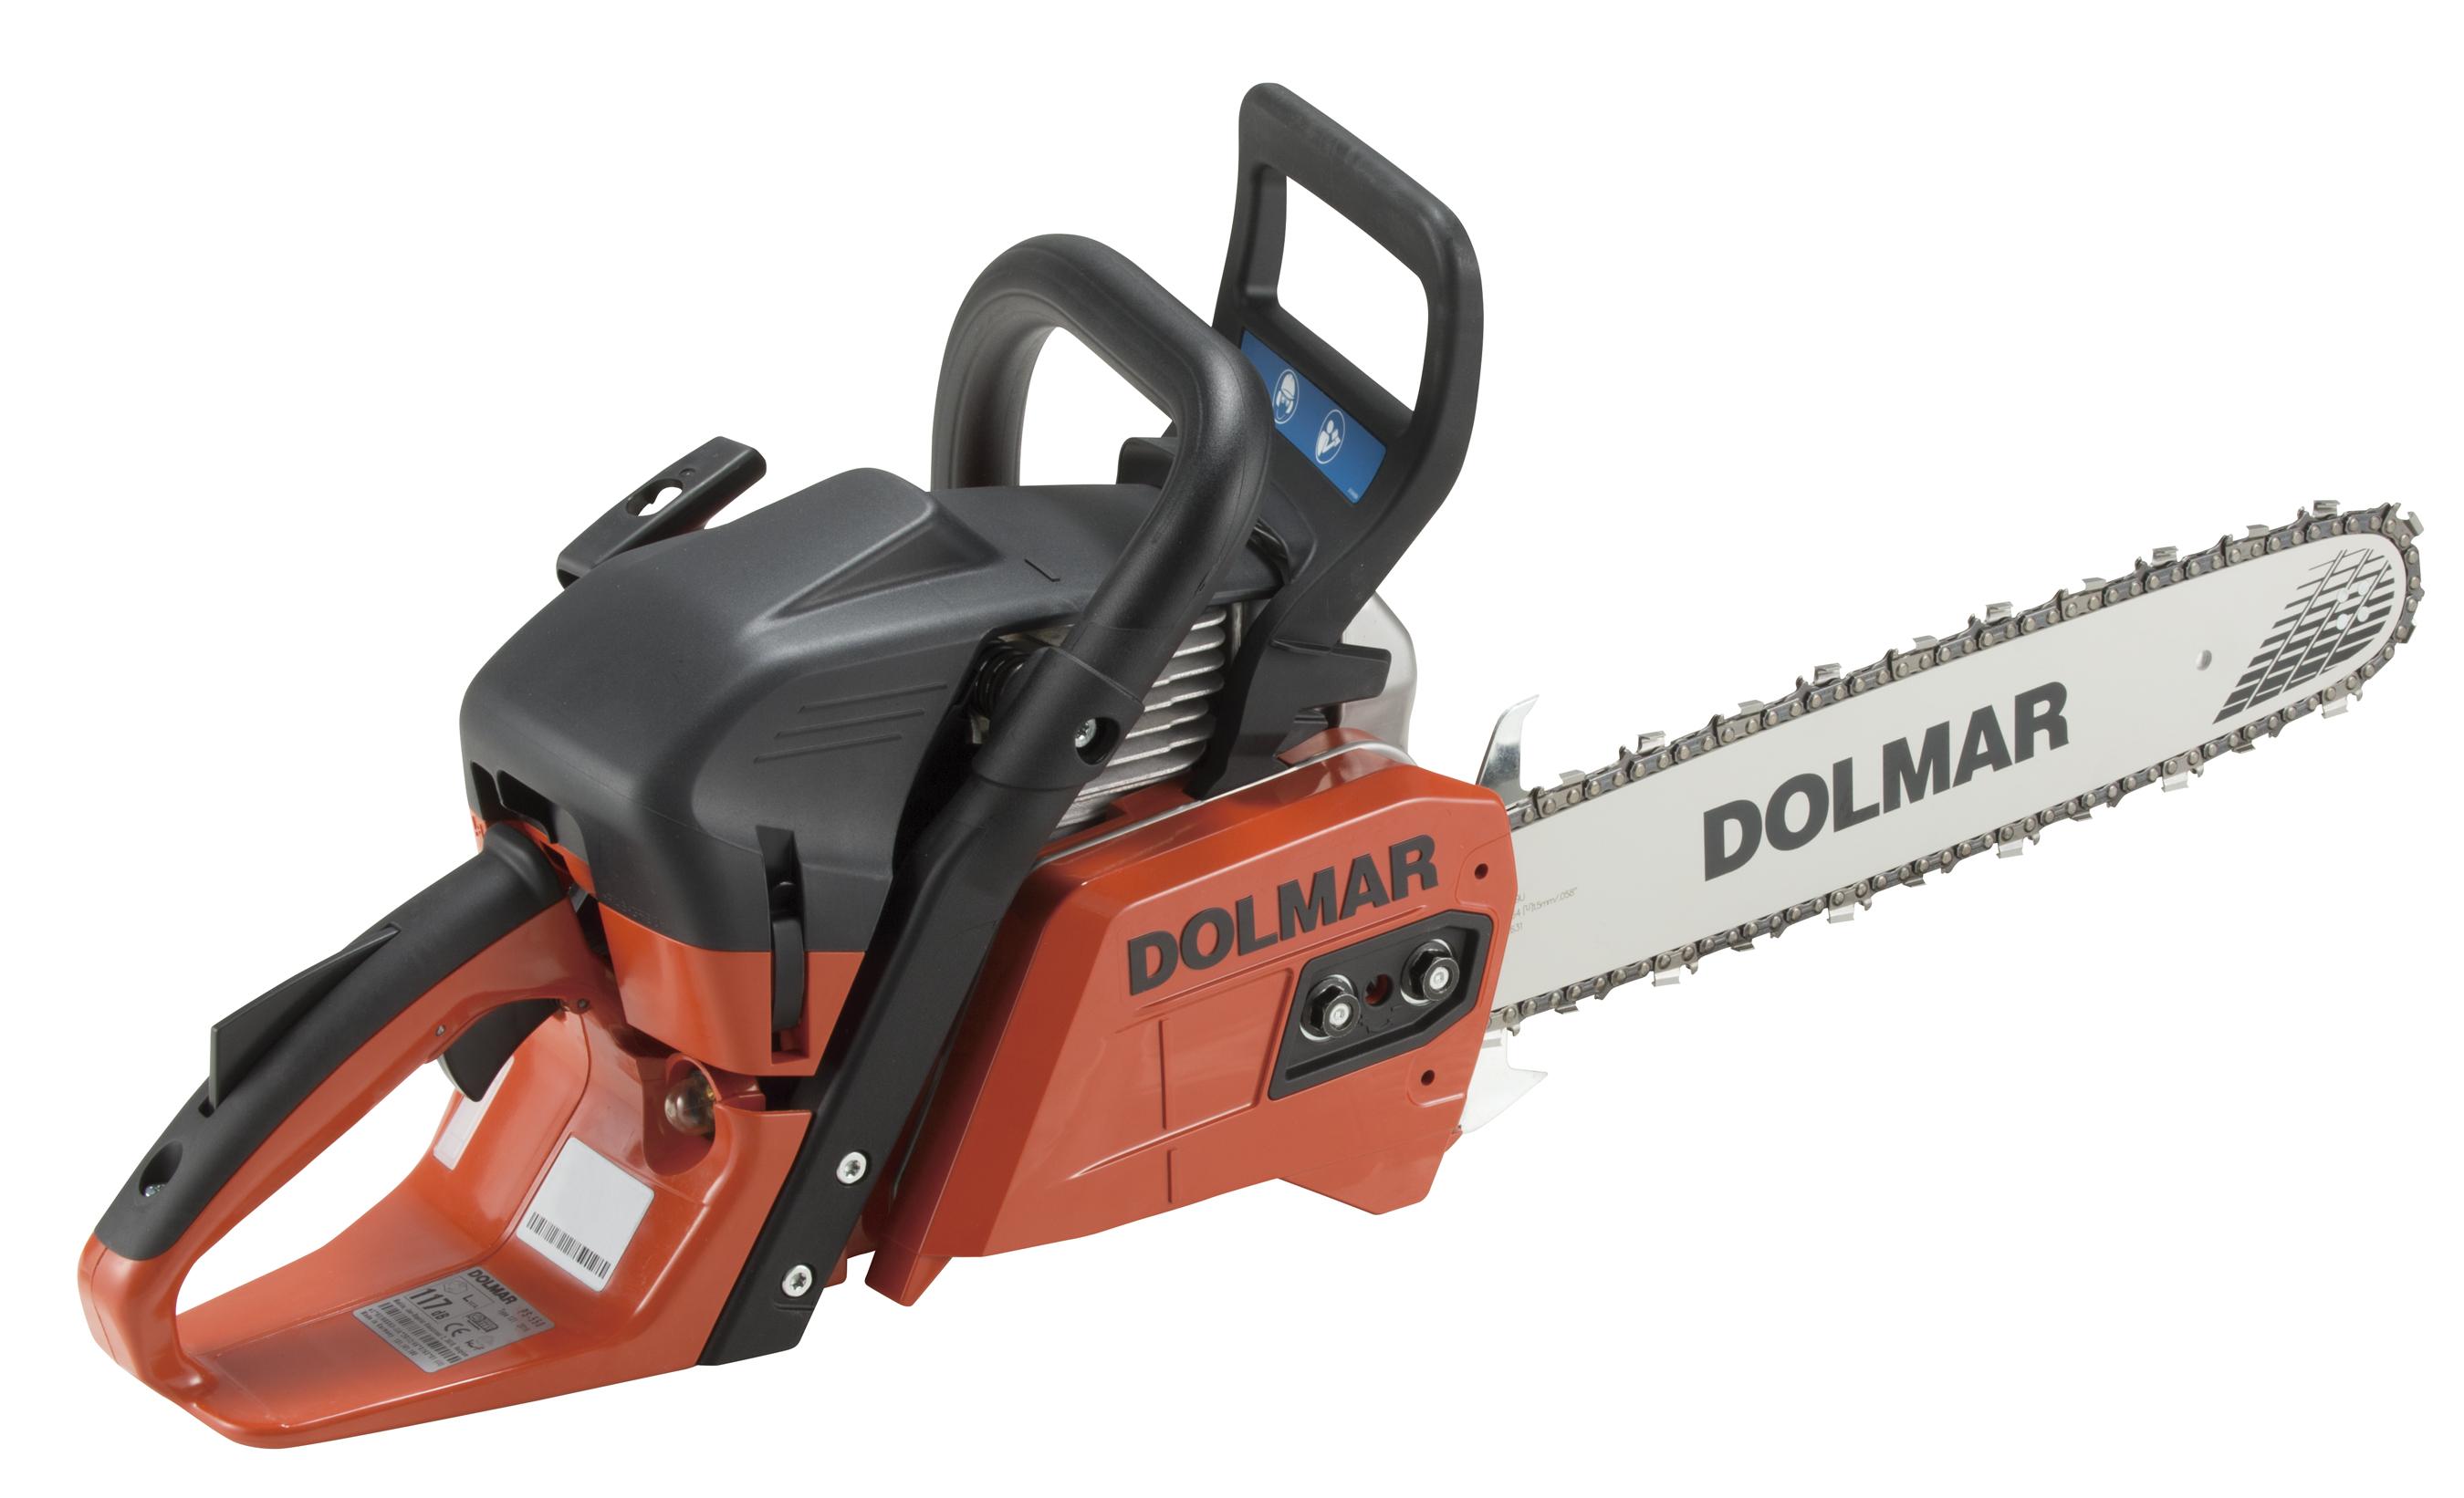 Benzin Kettensäge / Motorsäge Dolmar PS550-38325 38cm Bild 1